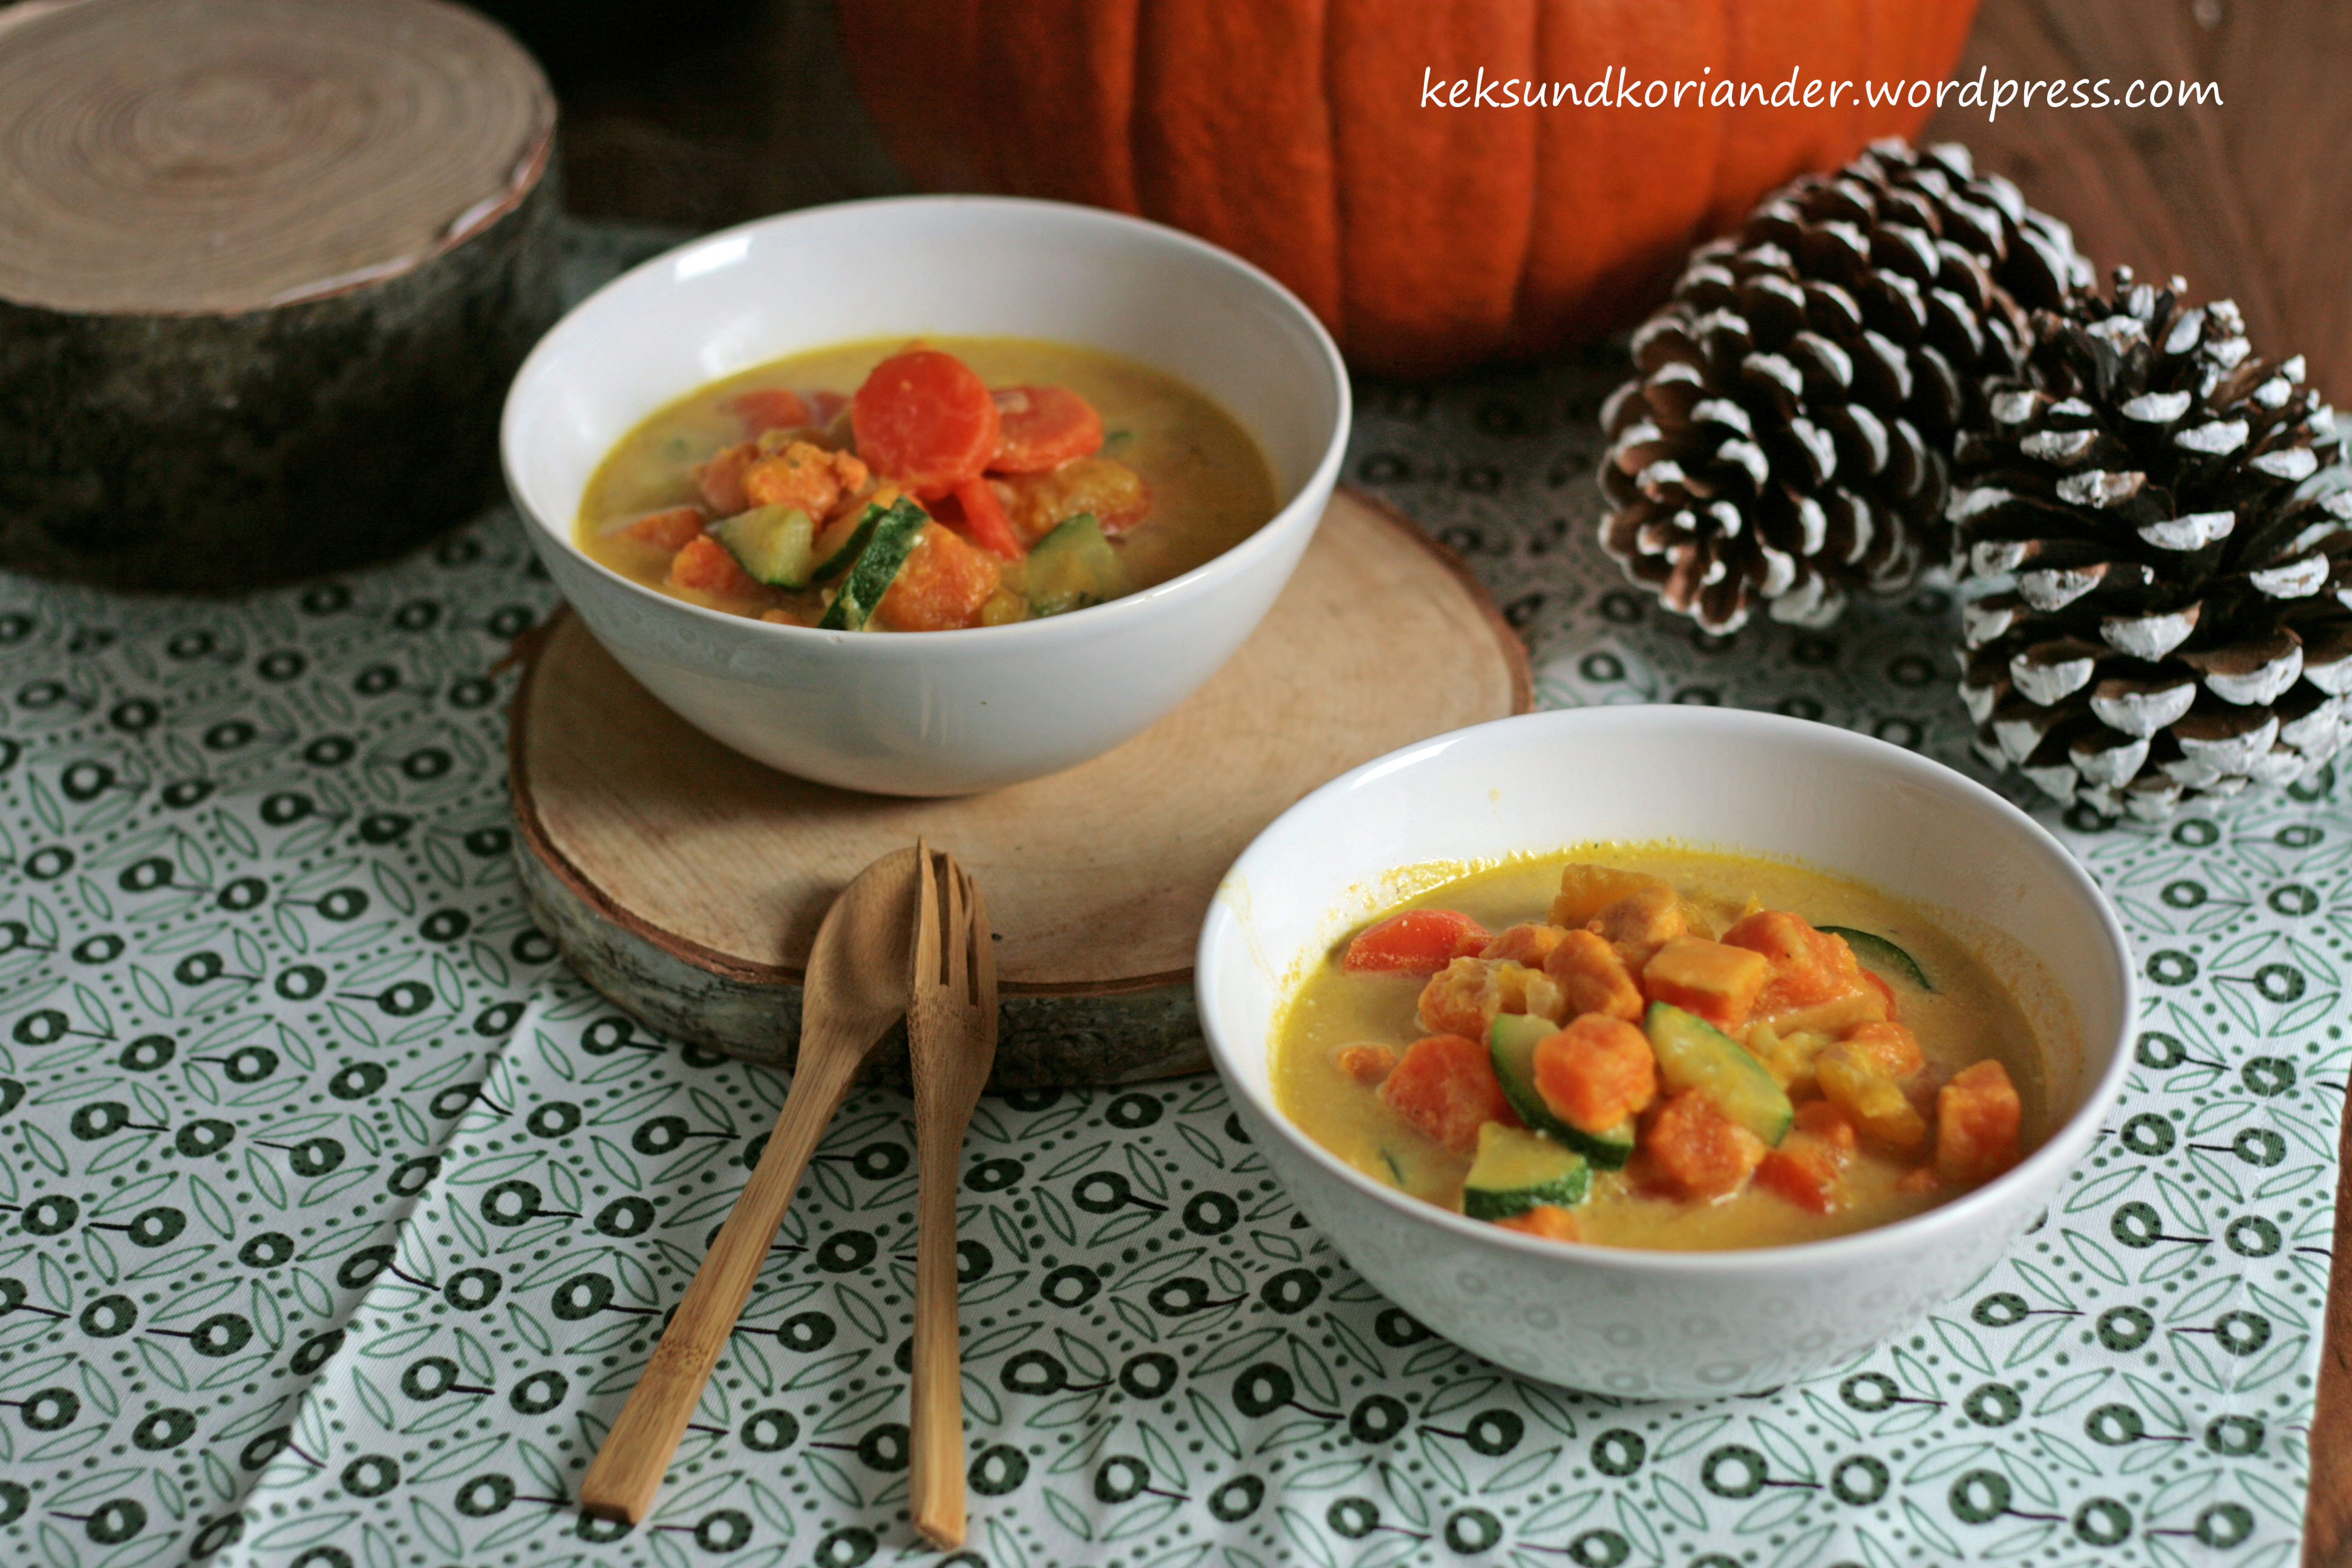 Kürbis-Süßkartoffel-Eintopf mit Curry